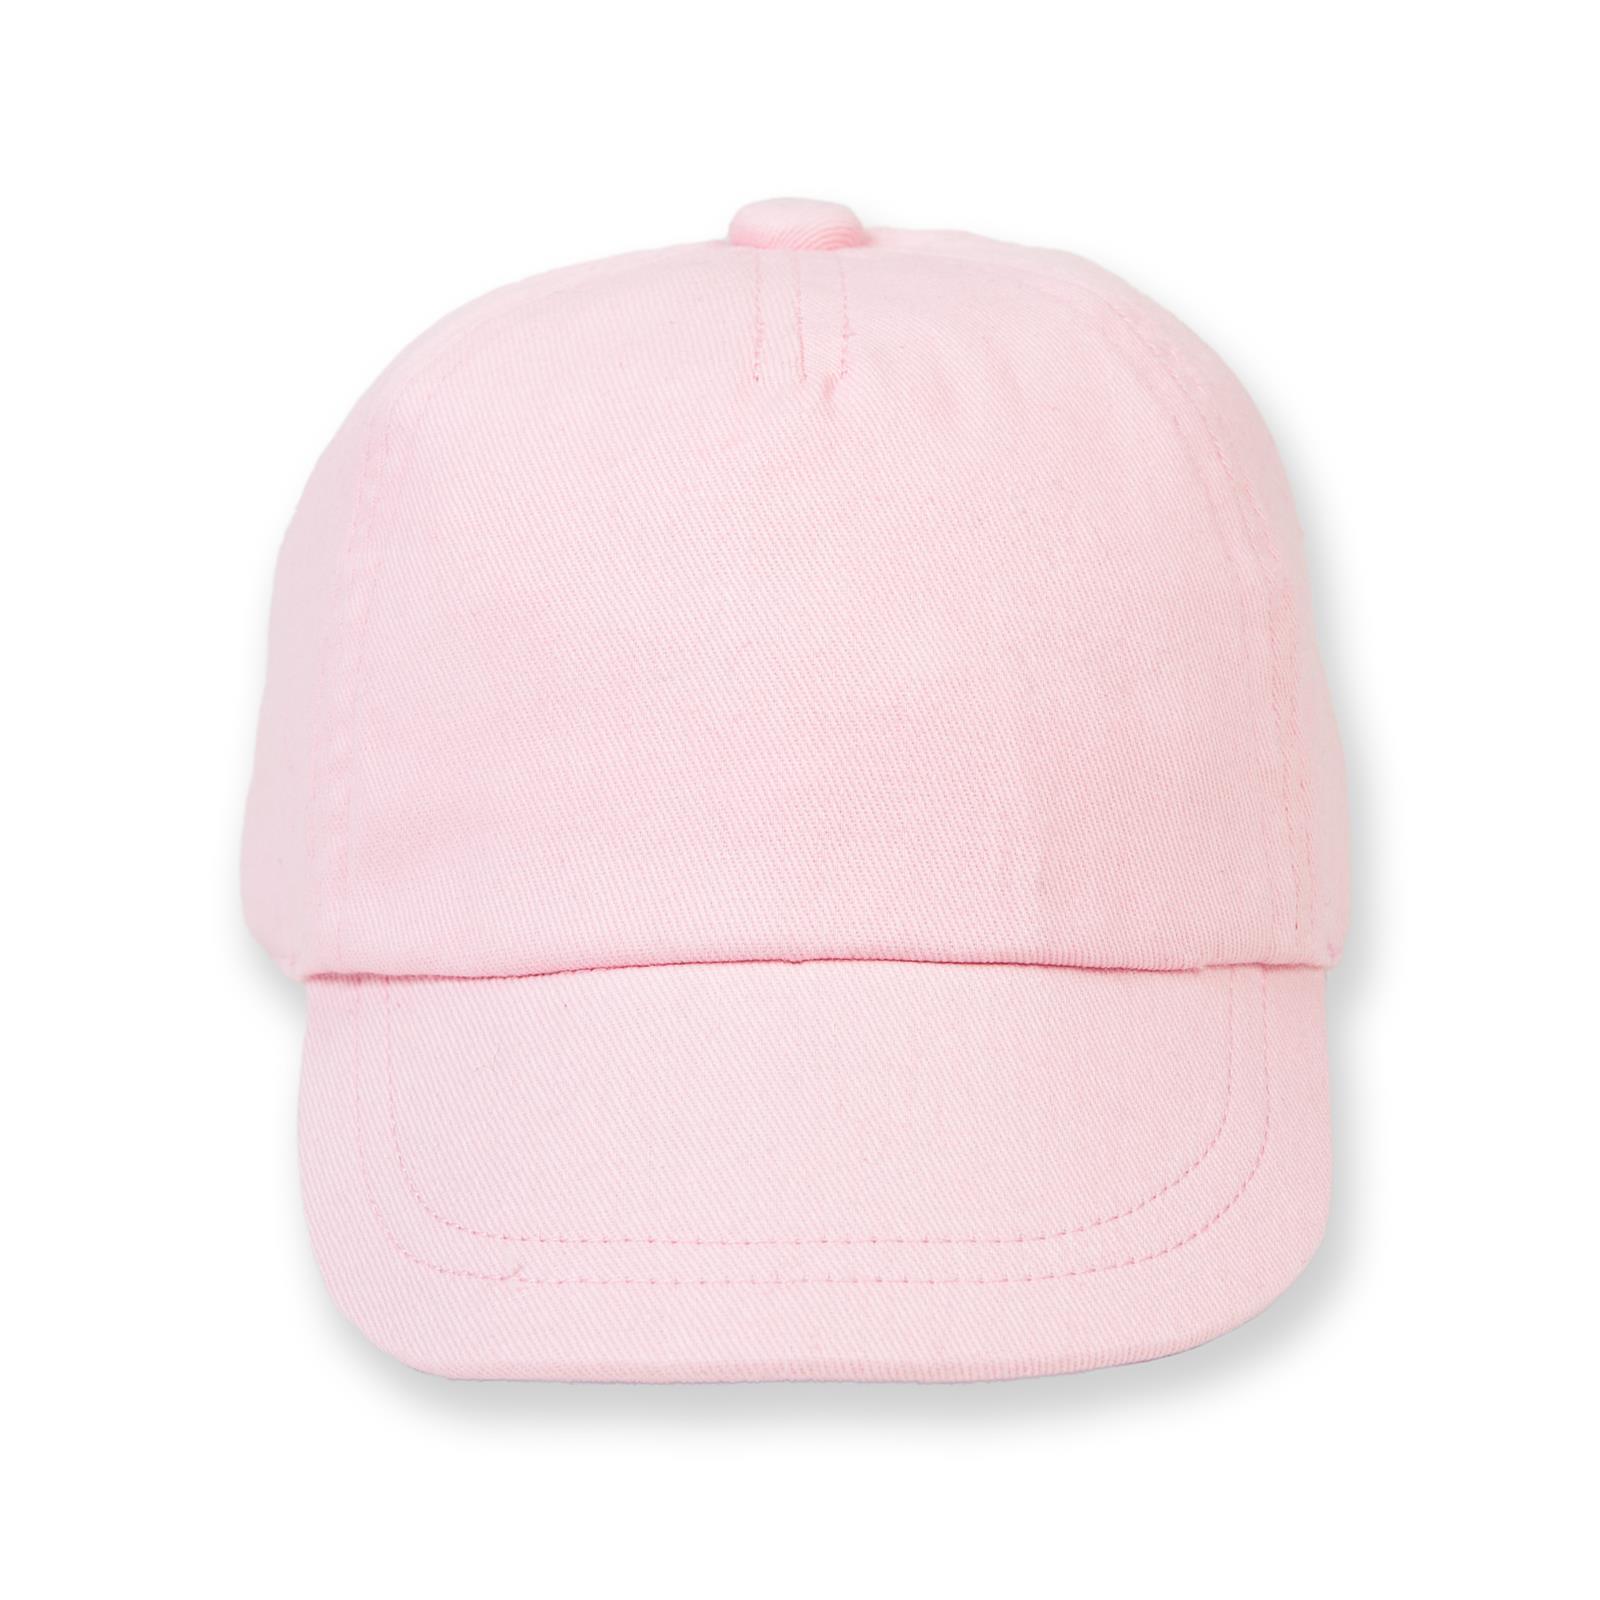 new larkwood baby infants cotton baseball cap hat in 4